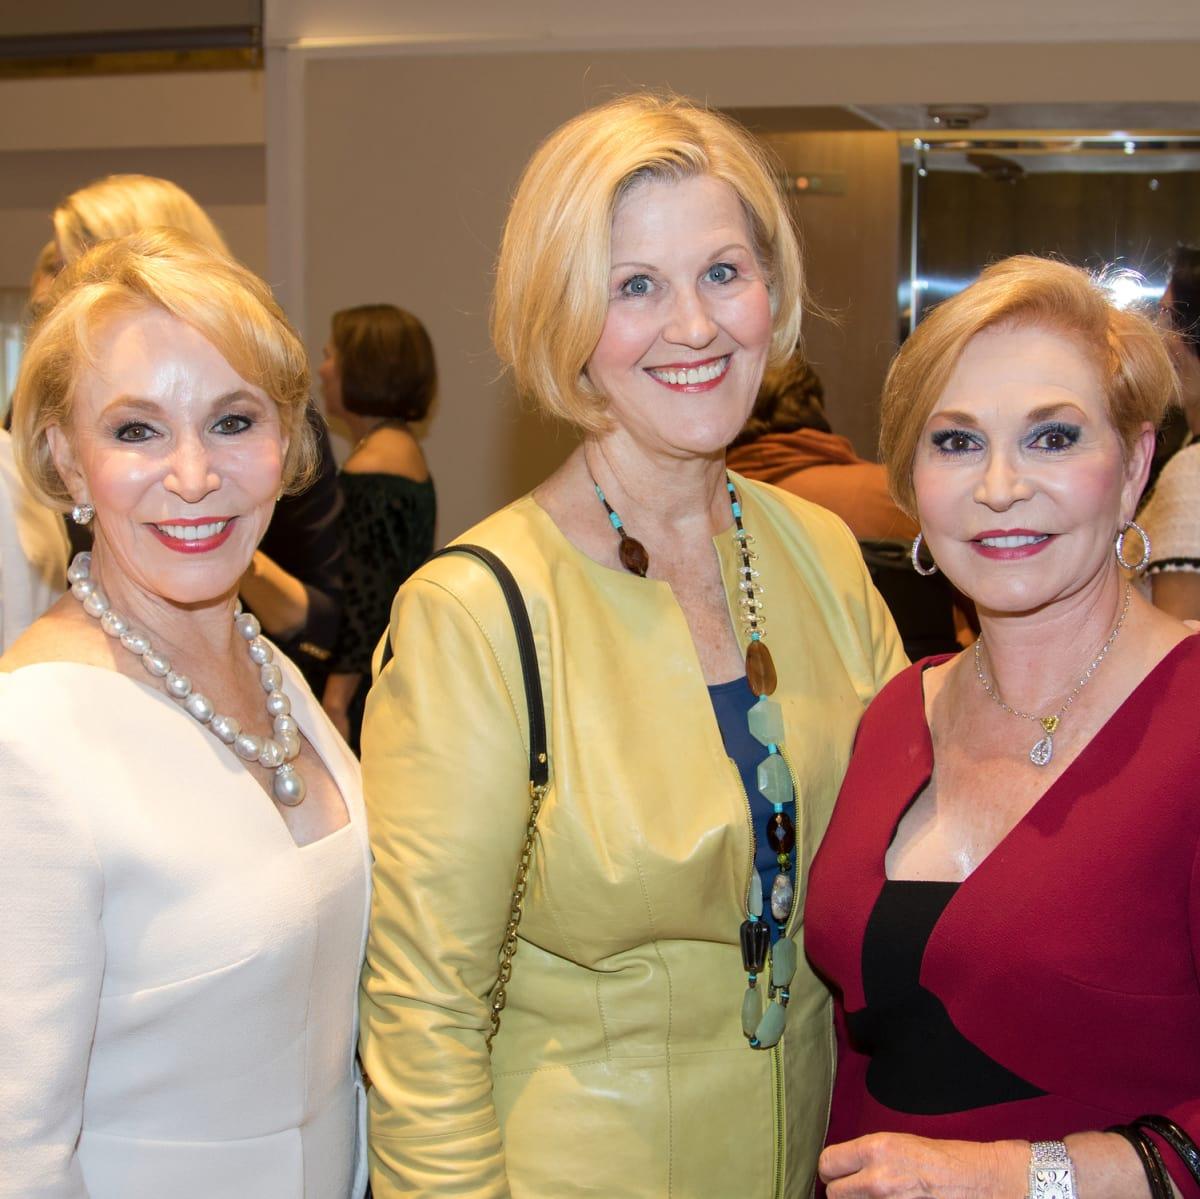 Carmine Godwin, Mary Anne Smiley, Carolyn McCutchin